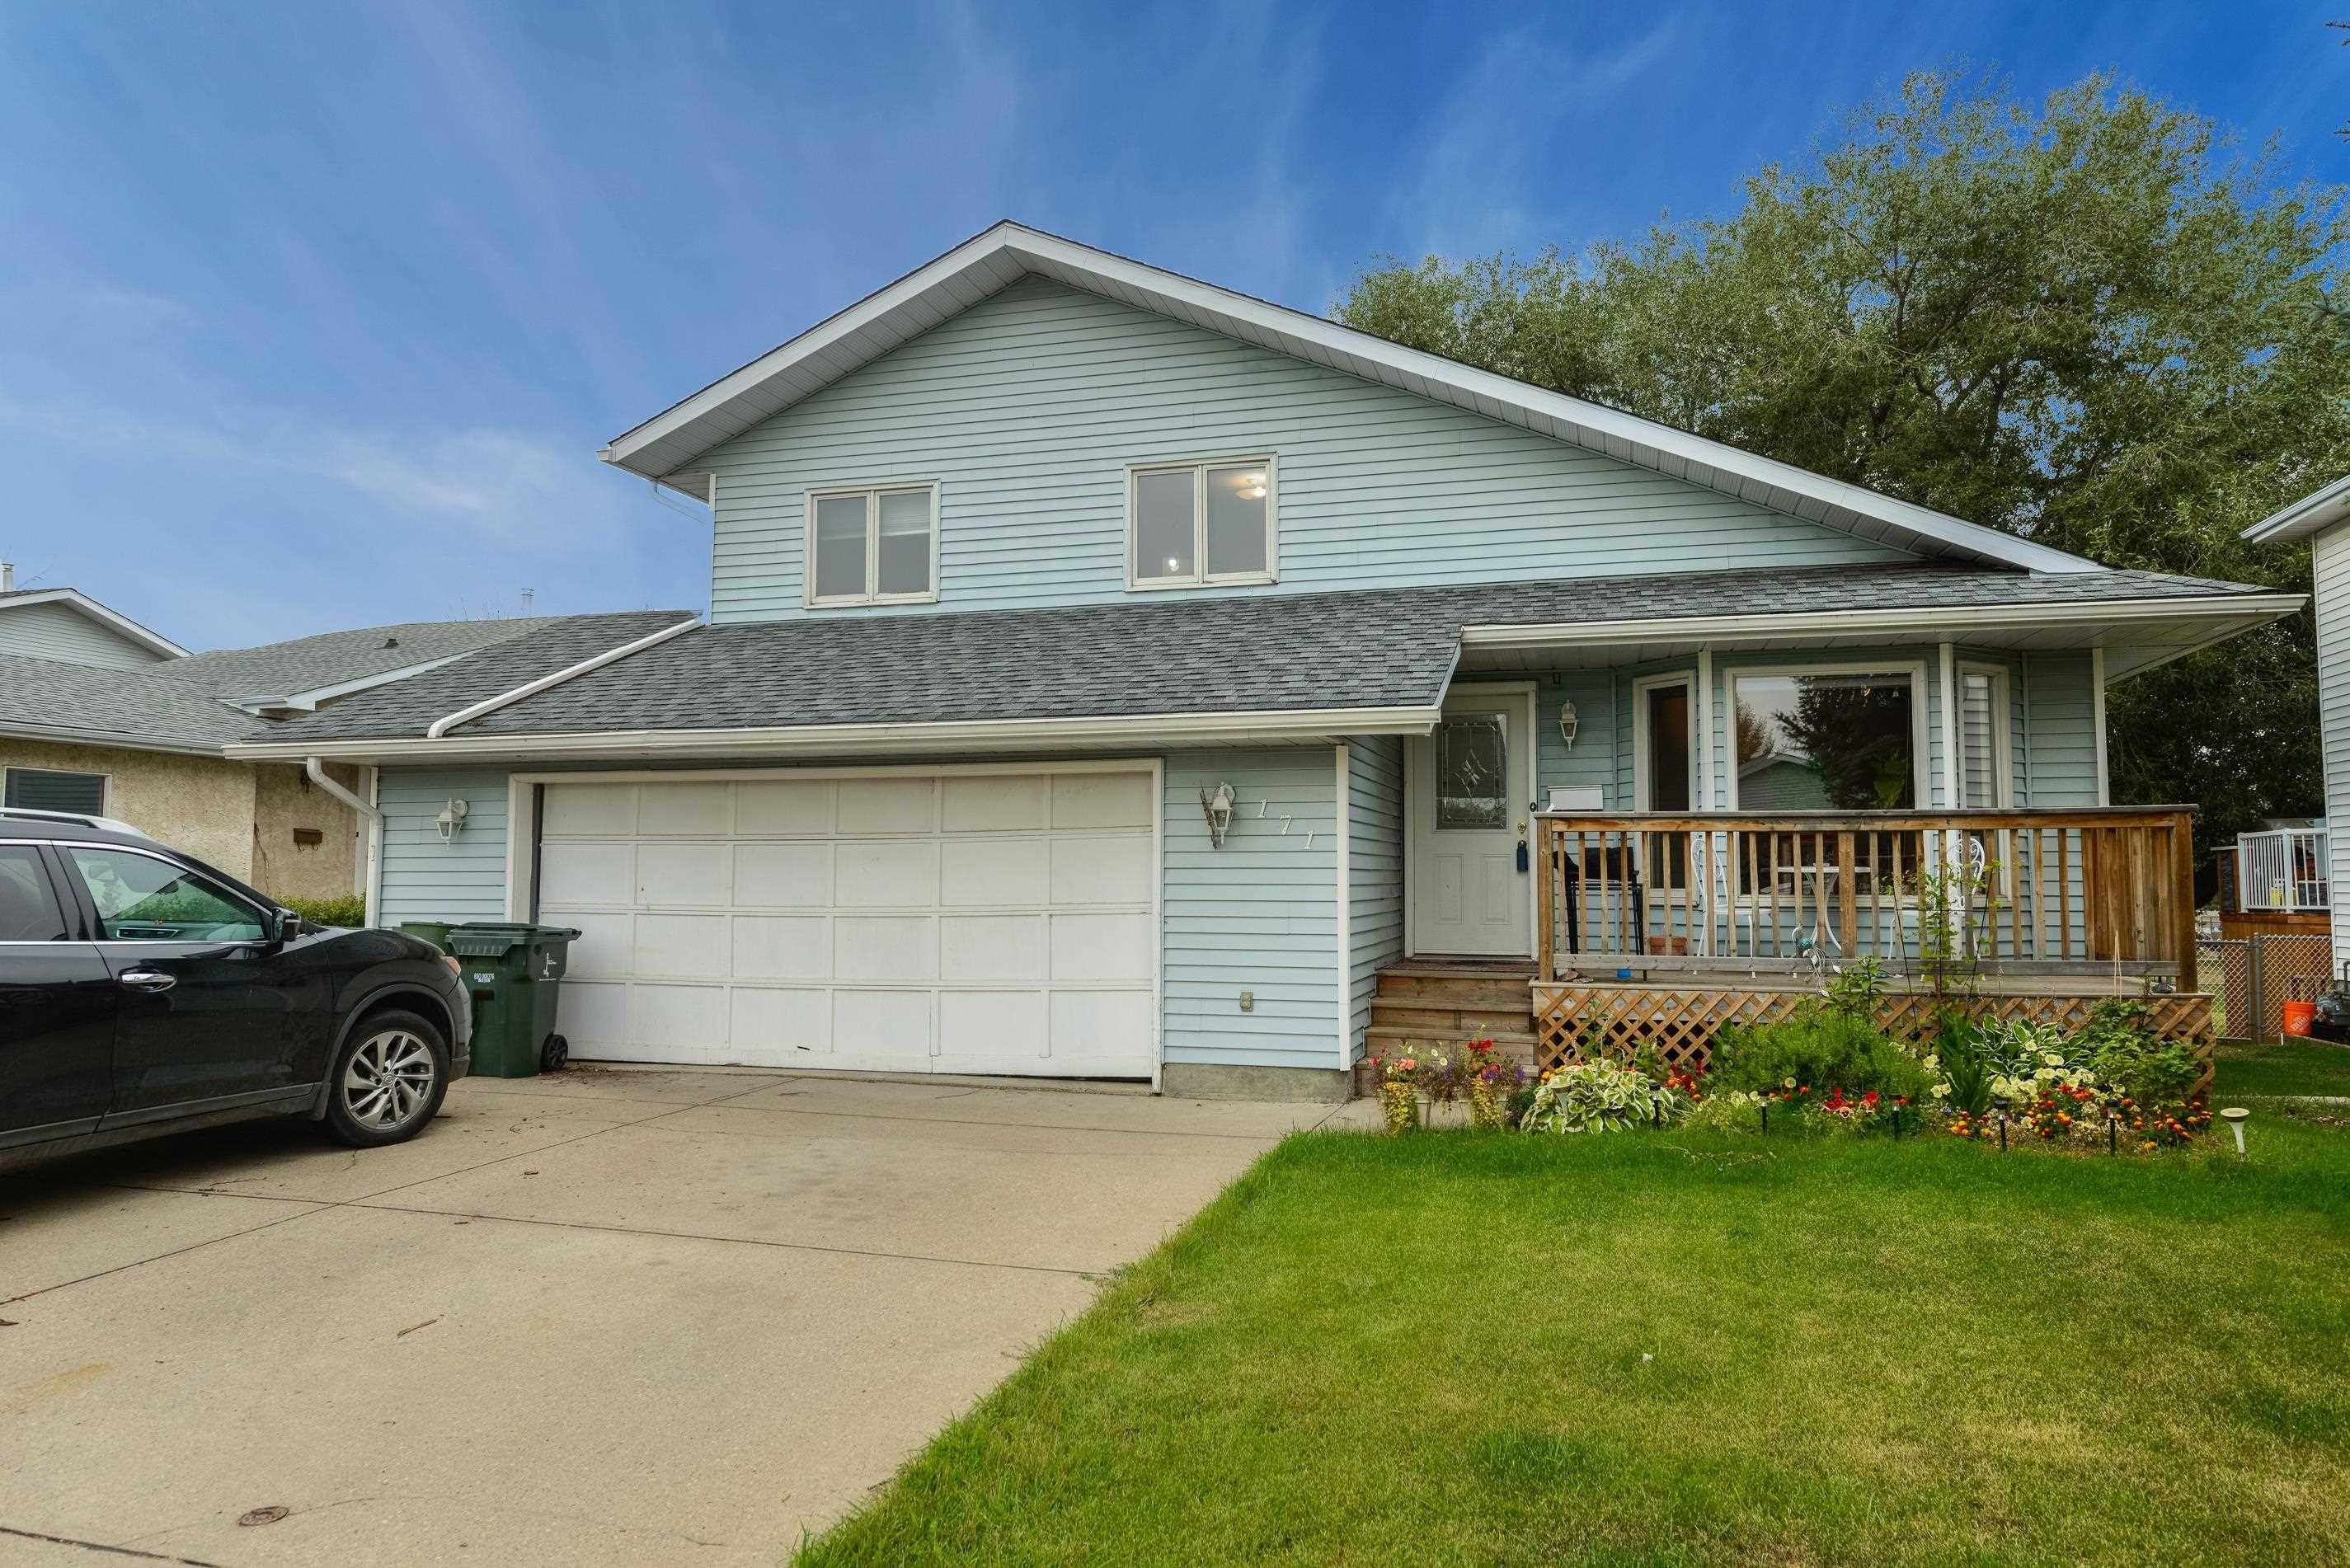 Main Photo: 171 ST. ANDREWS Drive: Stony Plain House for sale : MLS®# E4260753